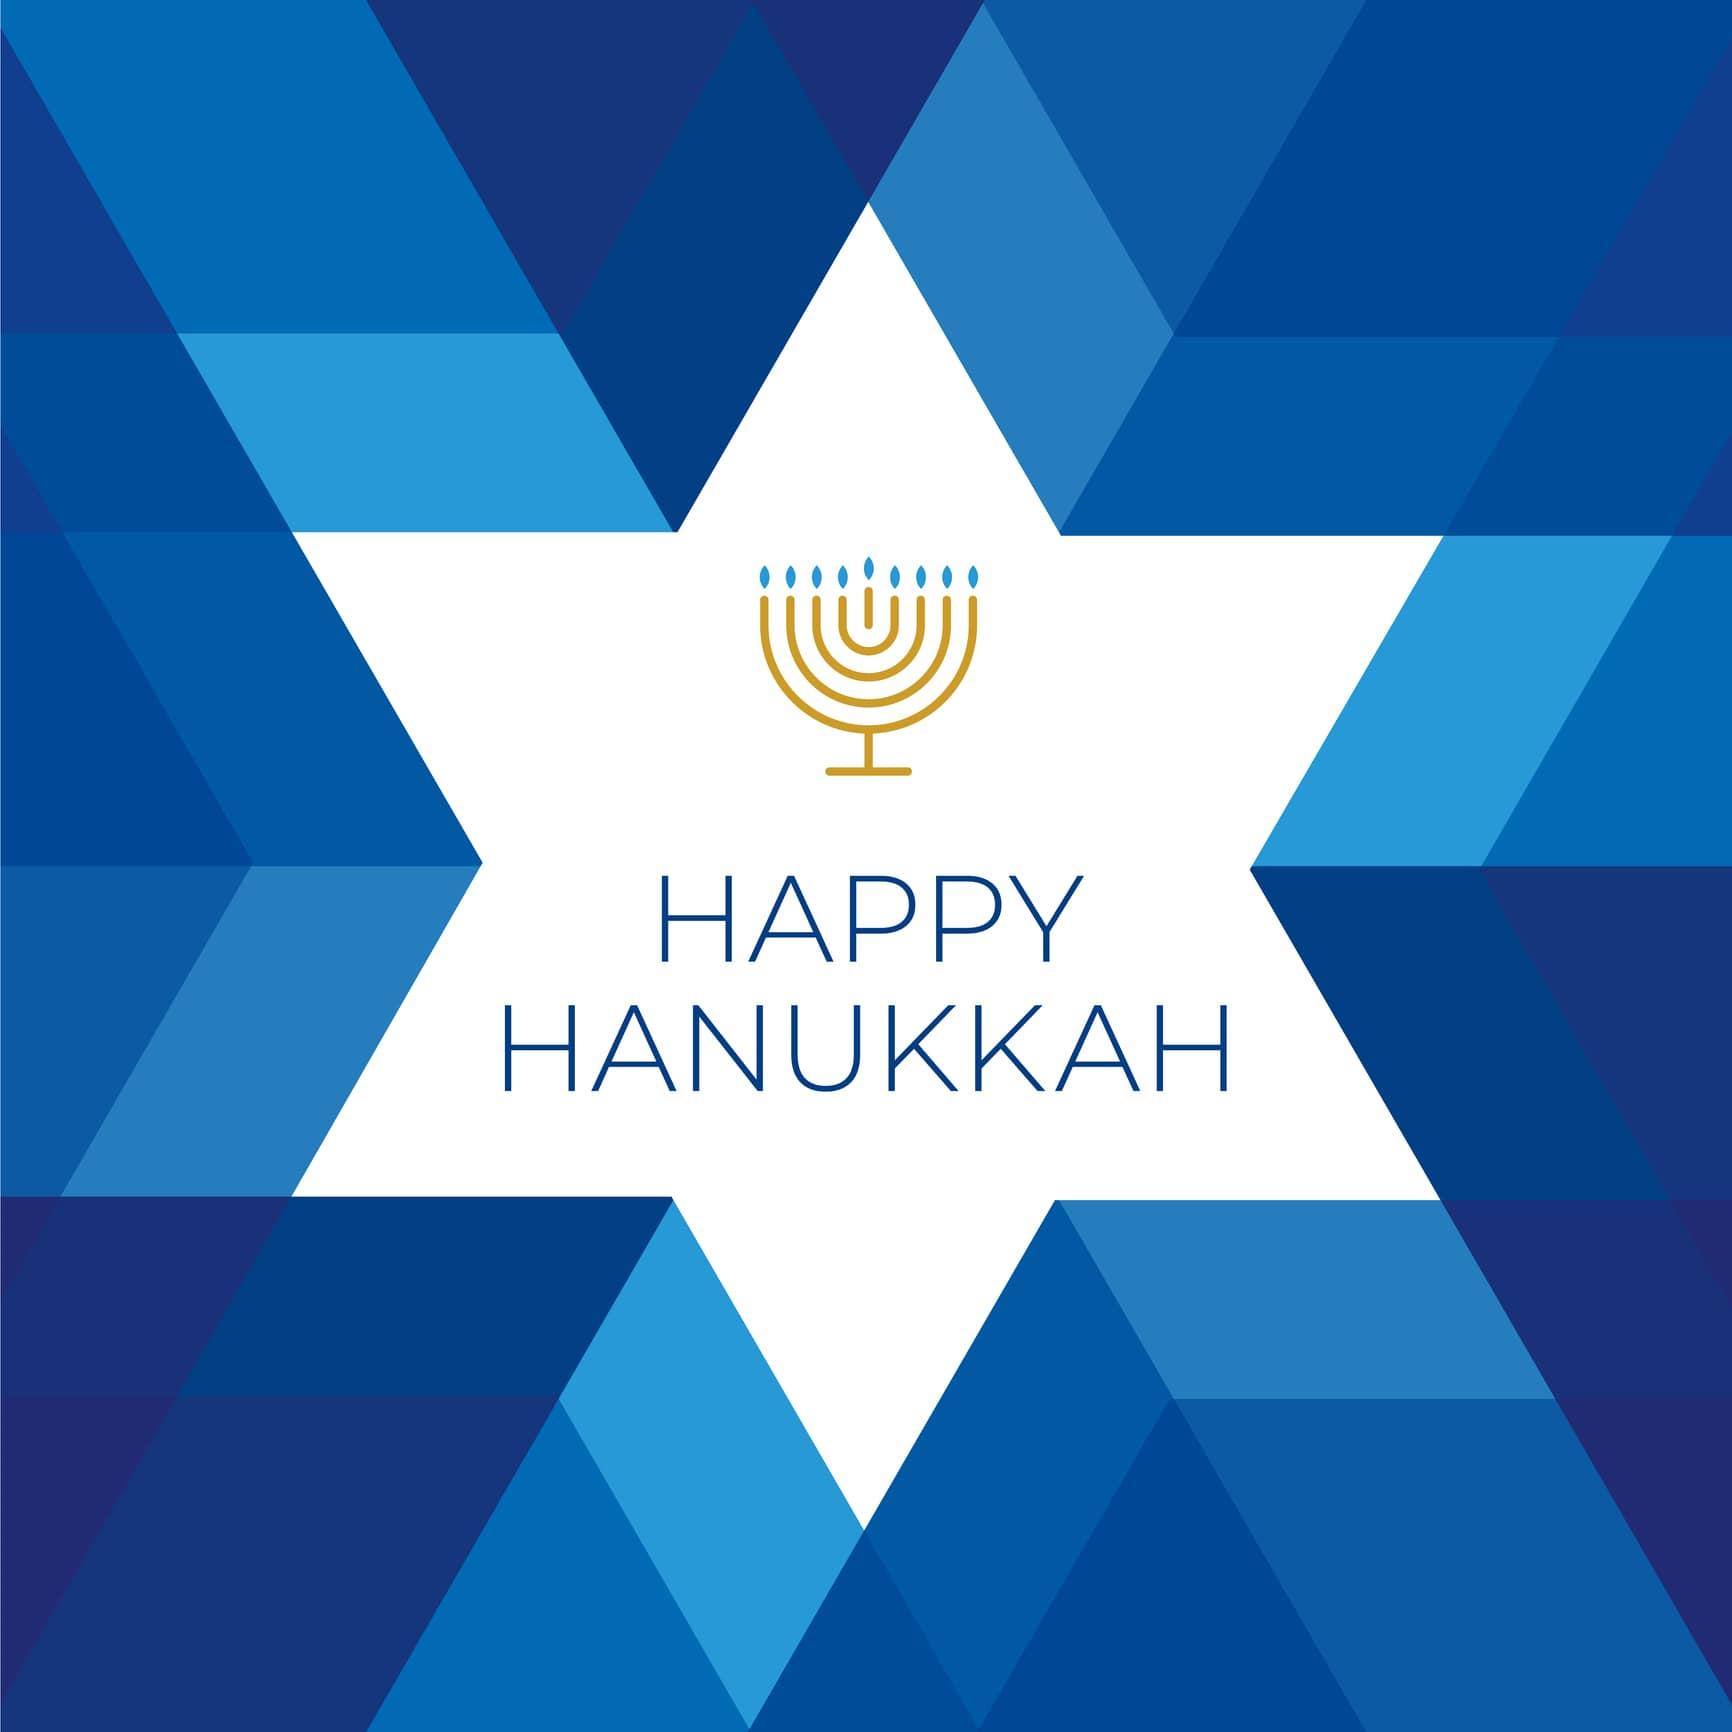 celebrate Hanukkah around Dallas Fort Worth